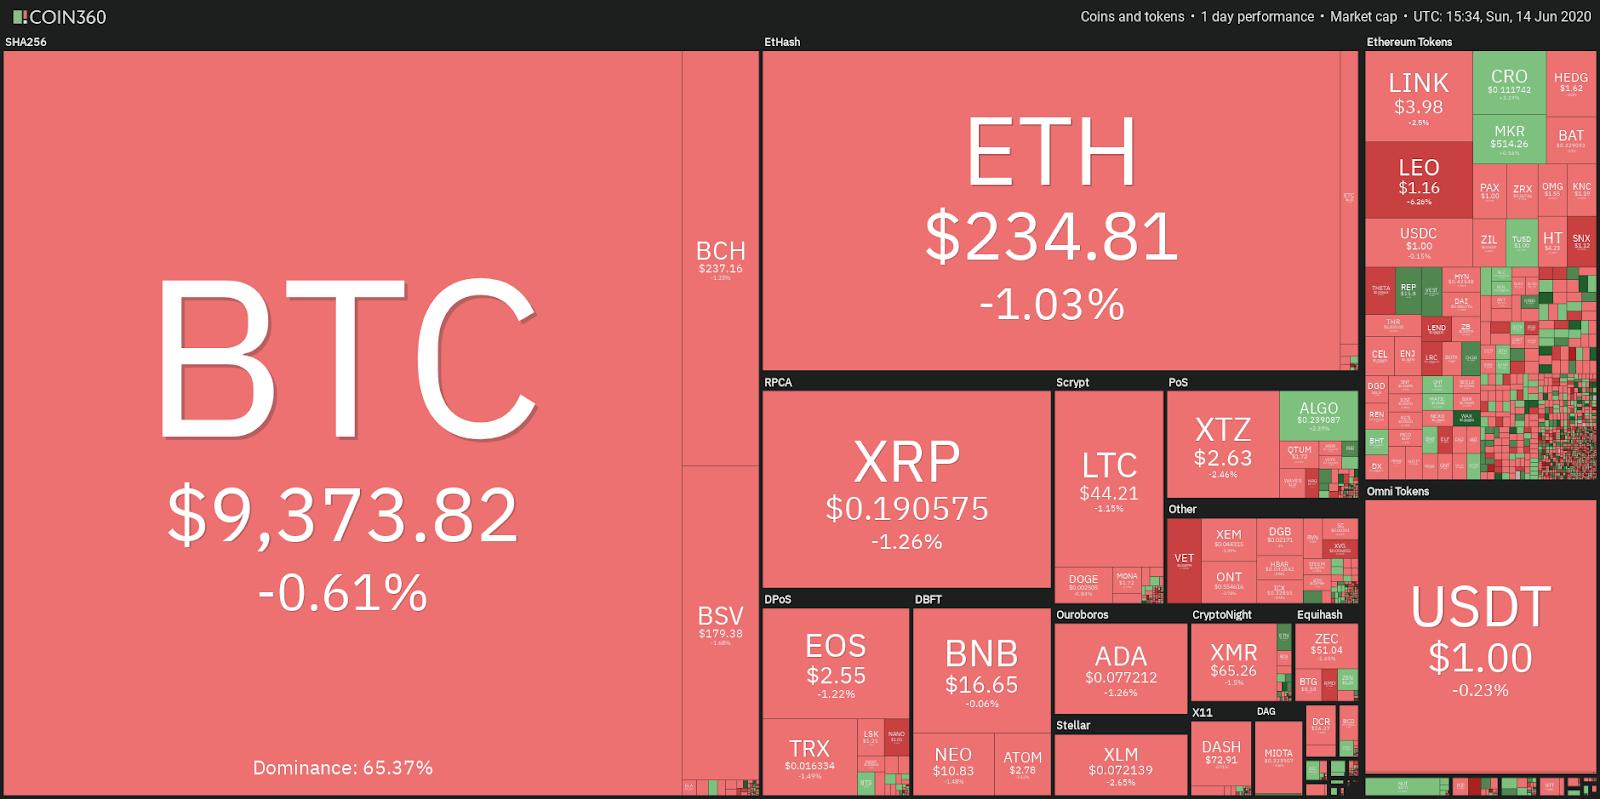 Top 5 Cryptocurrencies to Watch This Week: BTC, XTZ, XLM, ADA, NEO